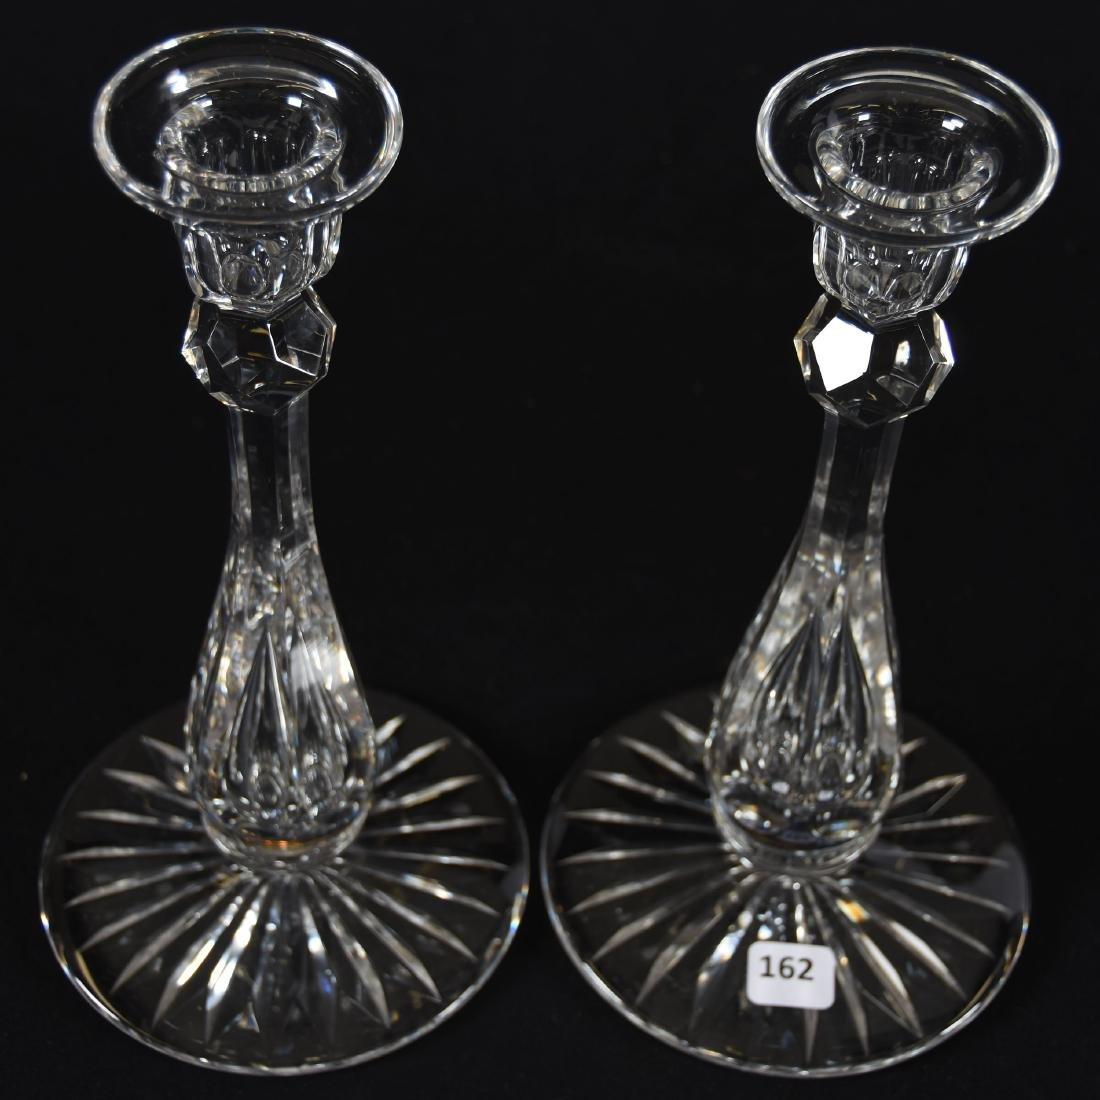 Pair Candlesticks, Six-Sided Stem - 2